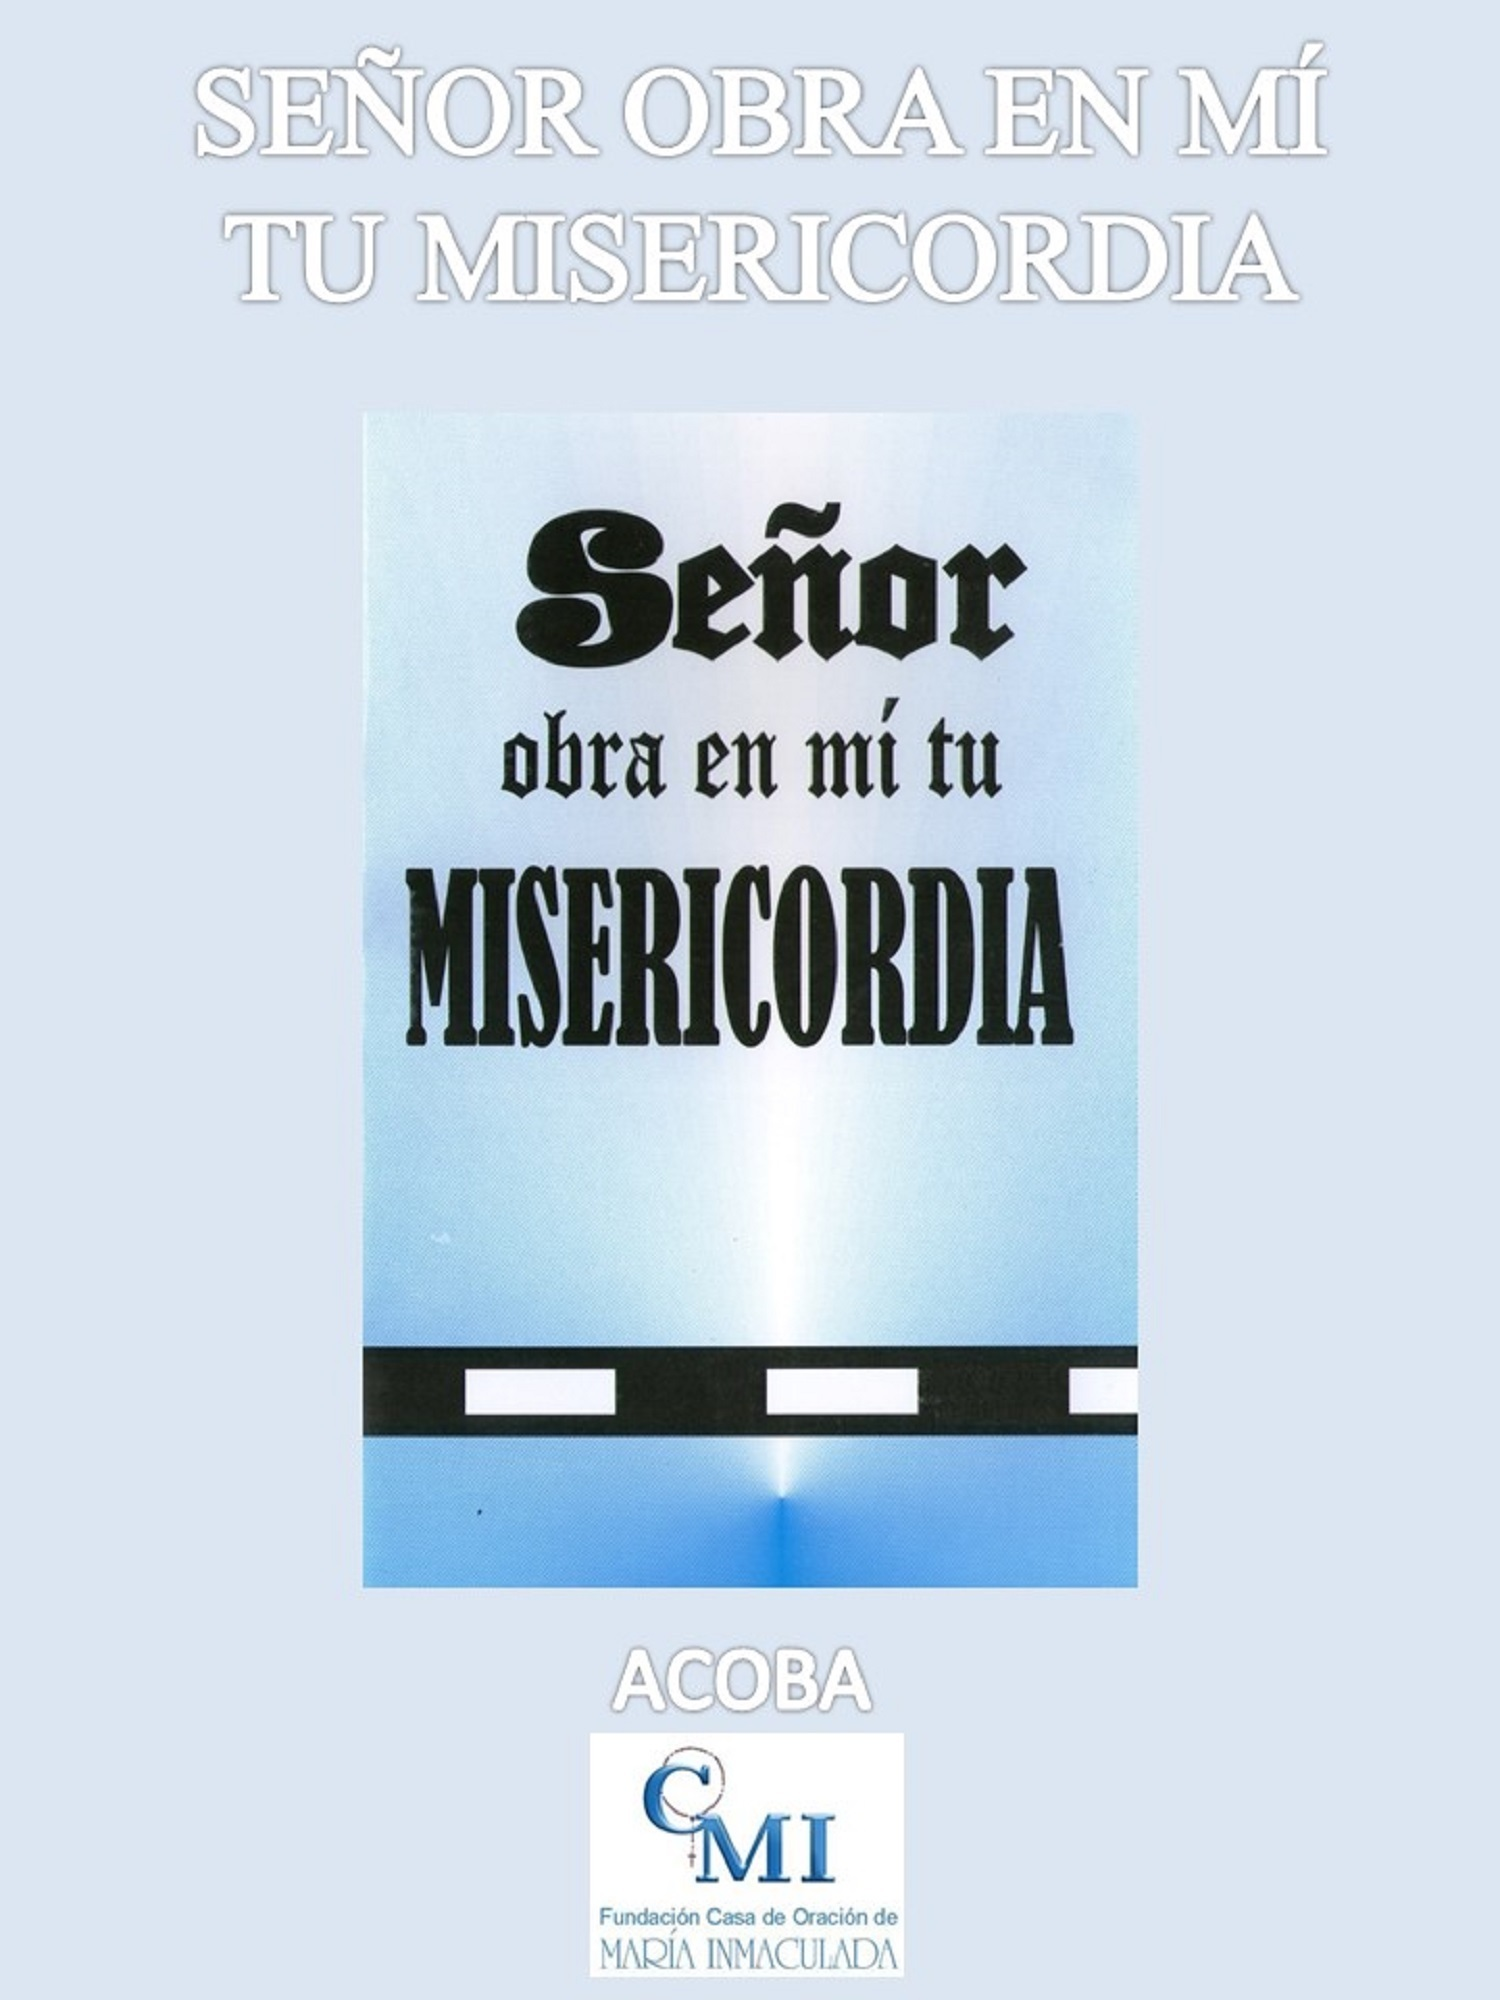 Señor obra en mí tu misericordia  by  Acoba